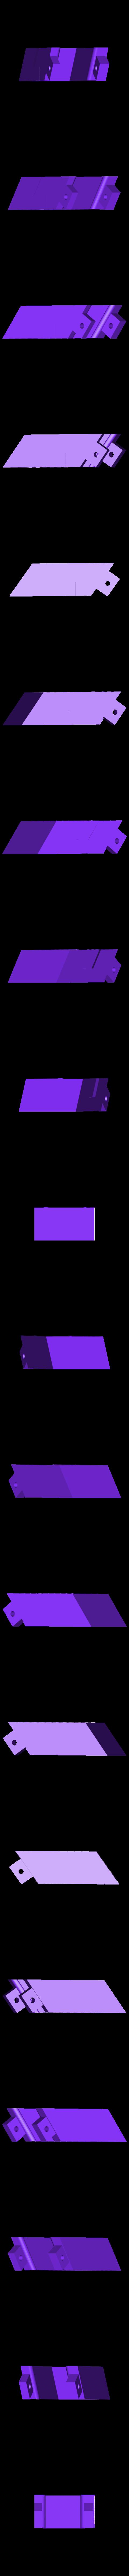 cup_h3.stl Download free STL file back door car cup holder • 3D printer model, mariospeed